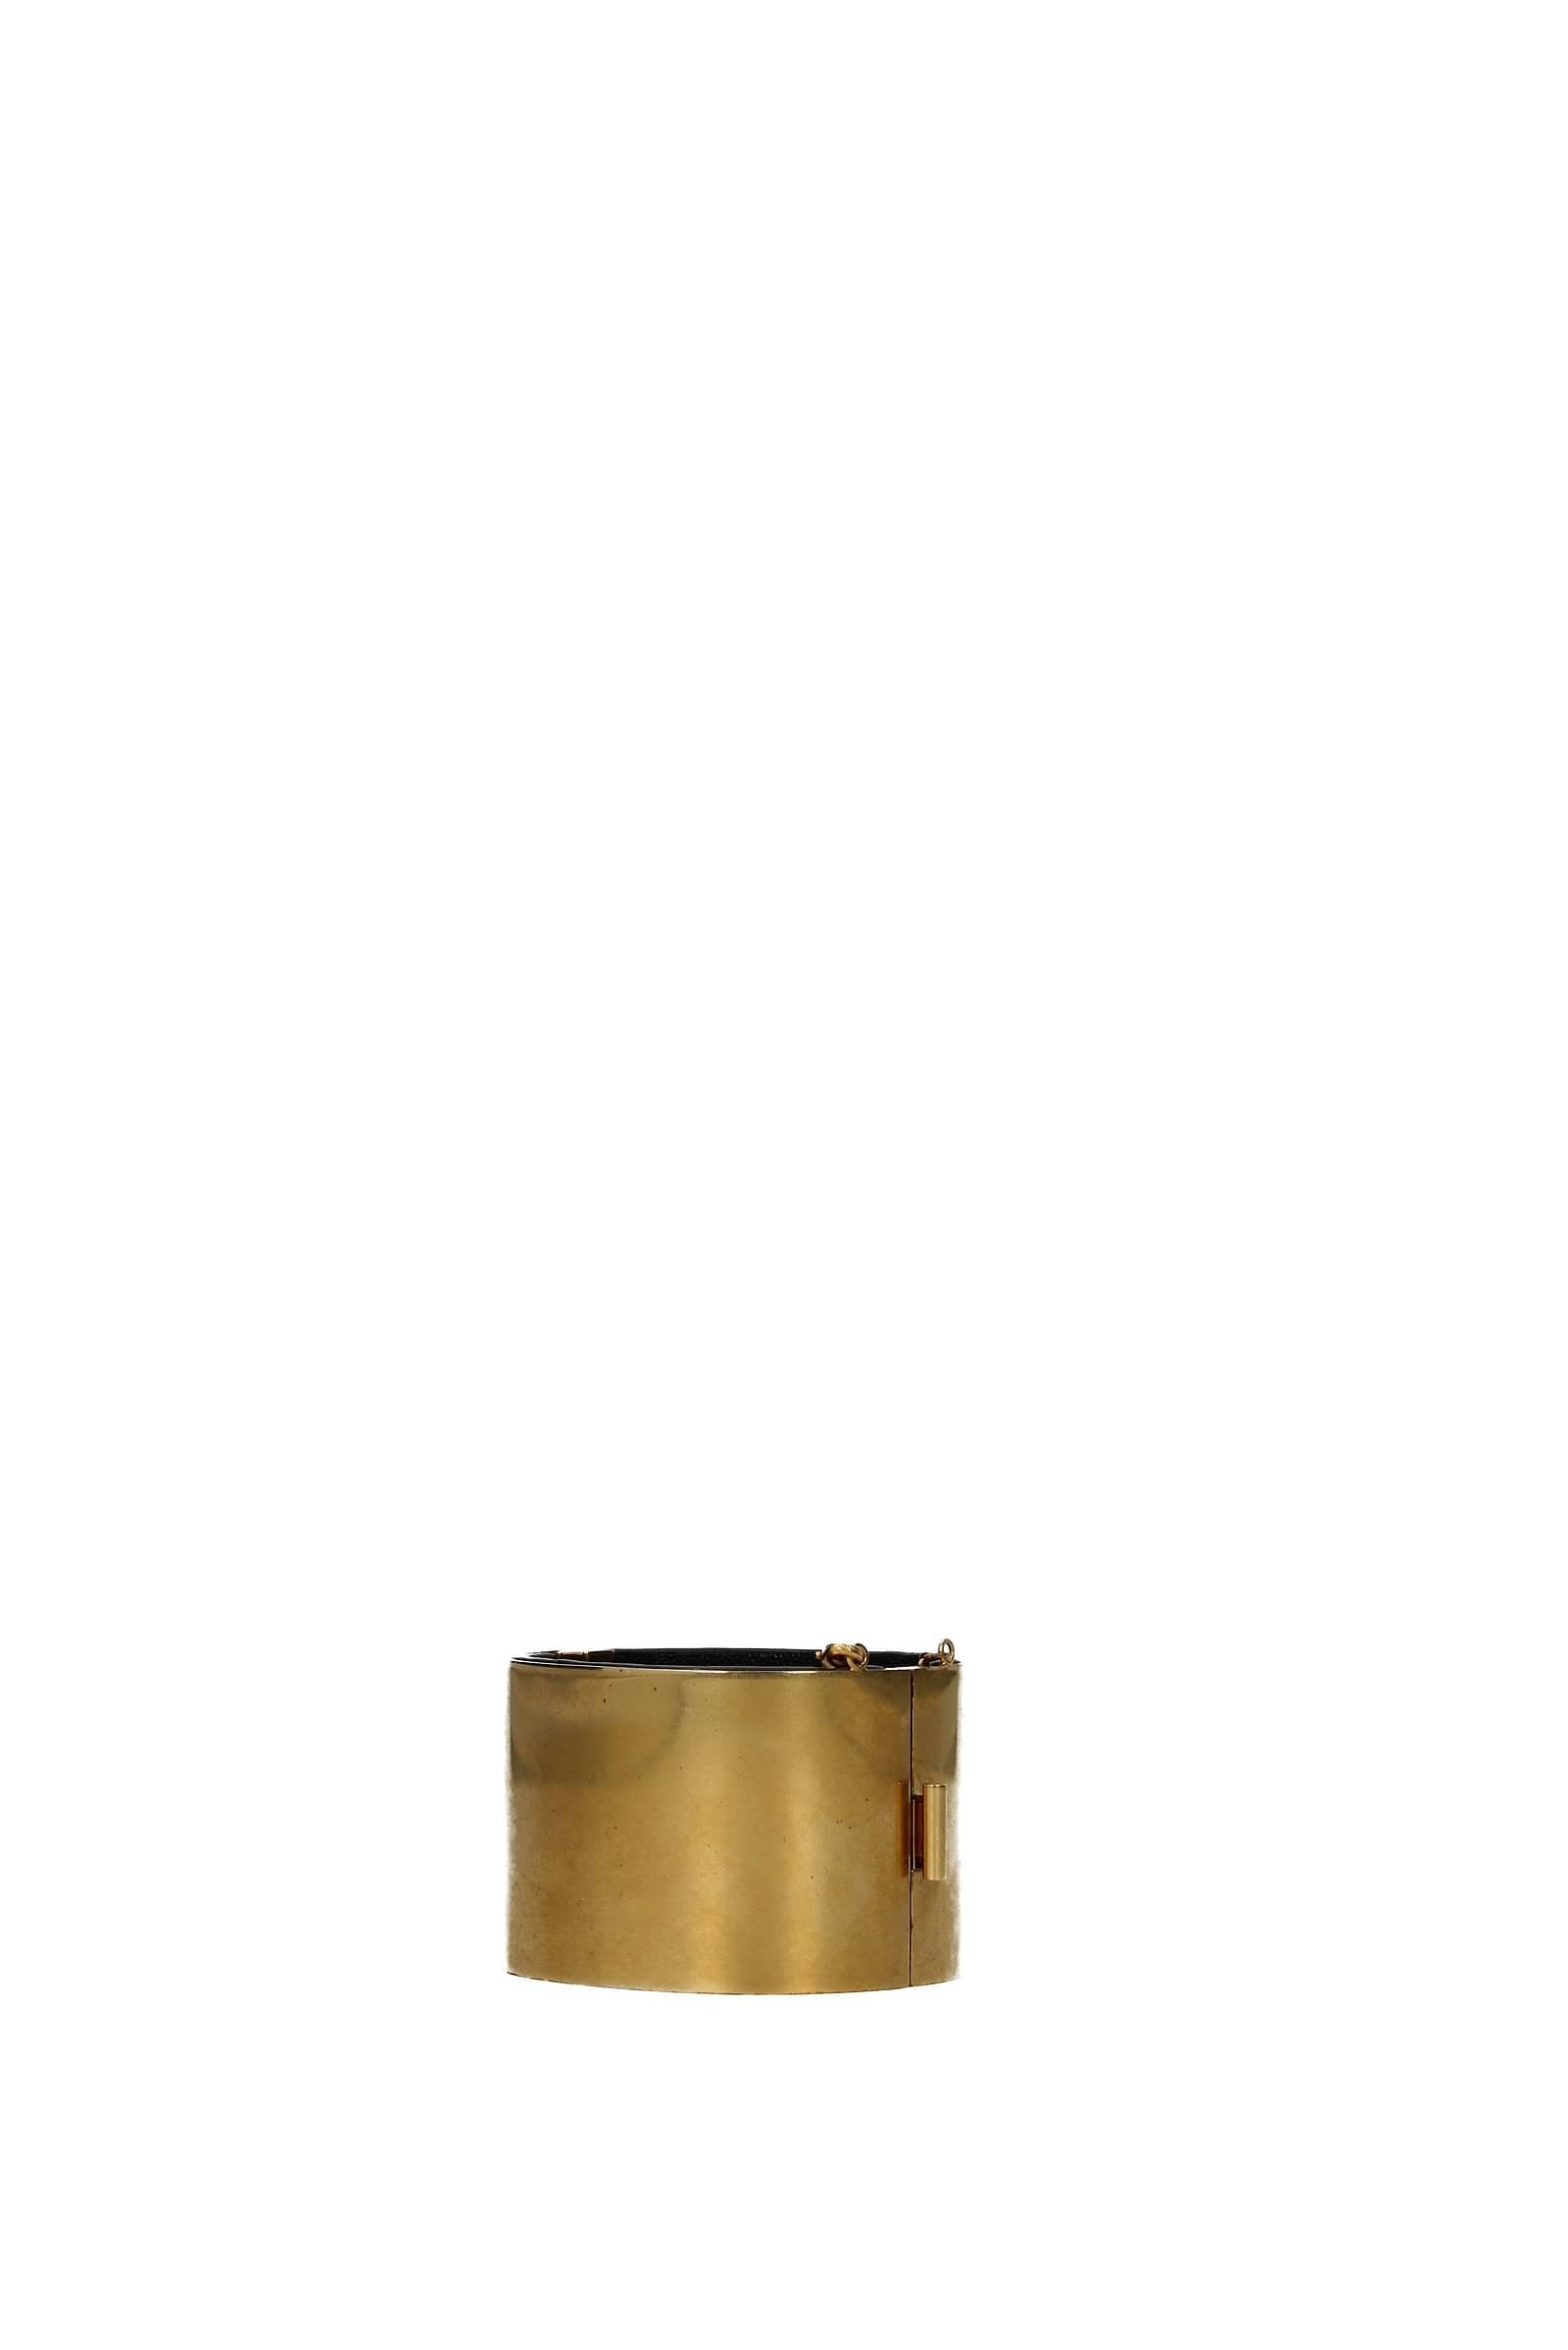 Bracciali-Celine-Donna-Ottone-46D116BR miniatura 2